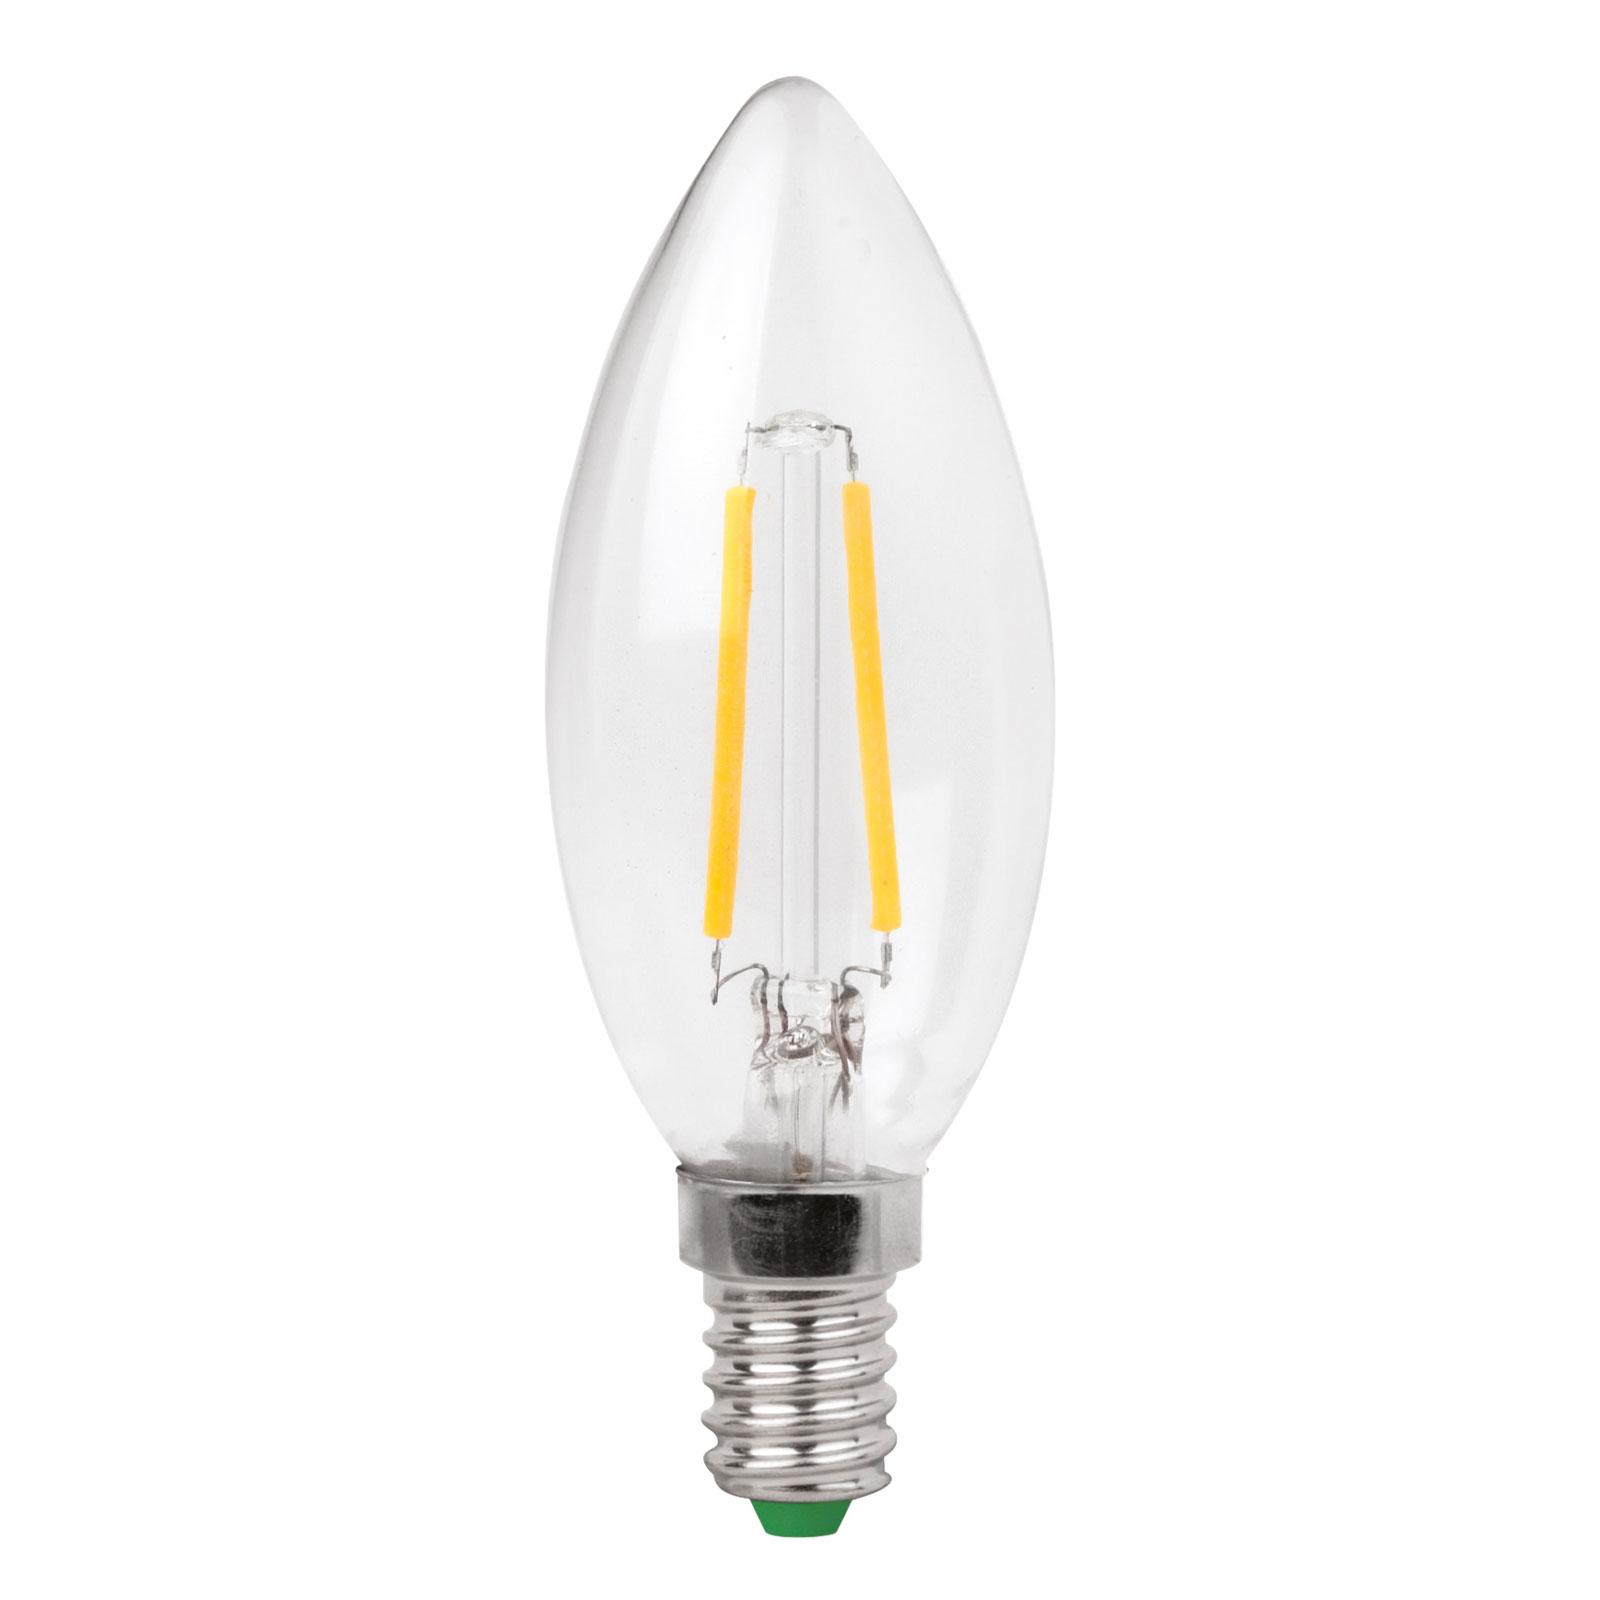 LED-Kerzenlampe E14 3W Filament klar, warmweiß günstig online kaufen